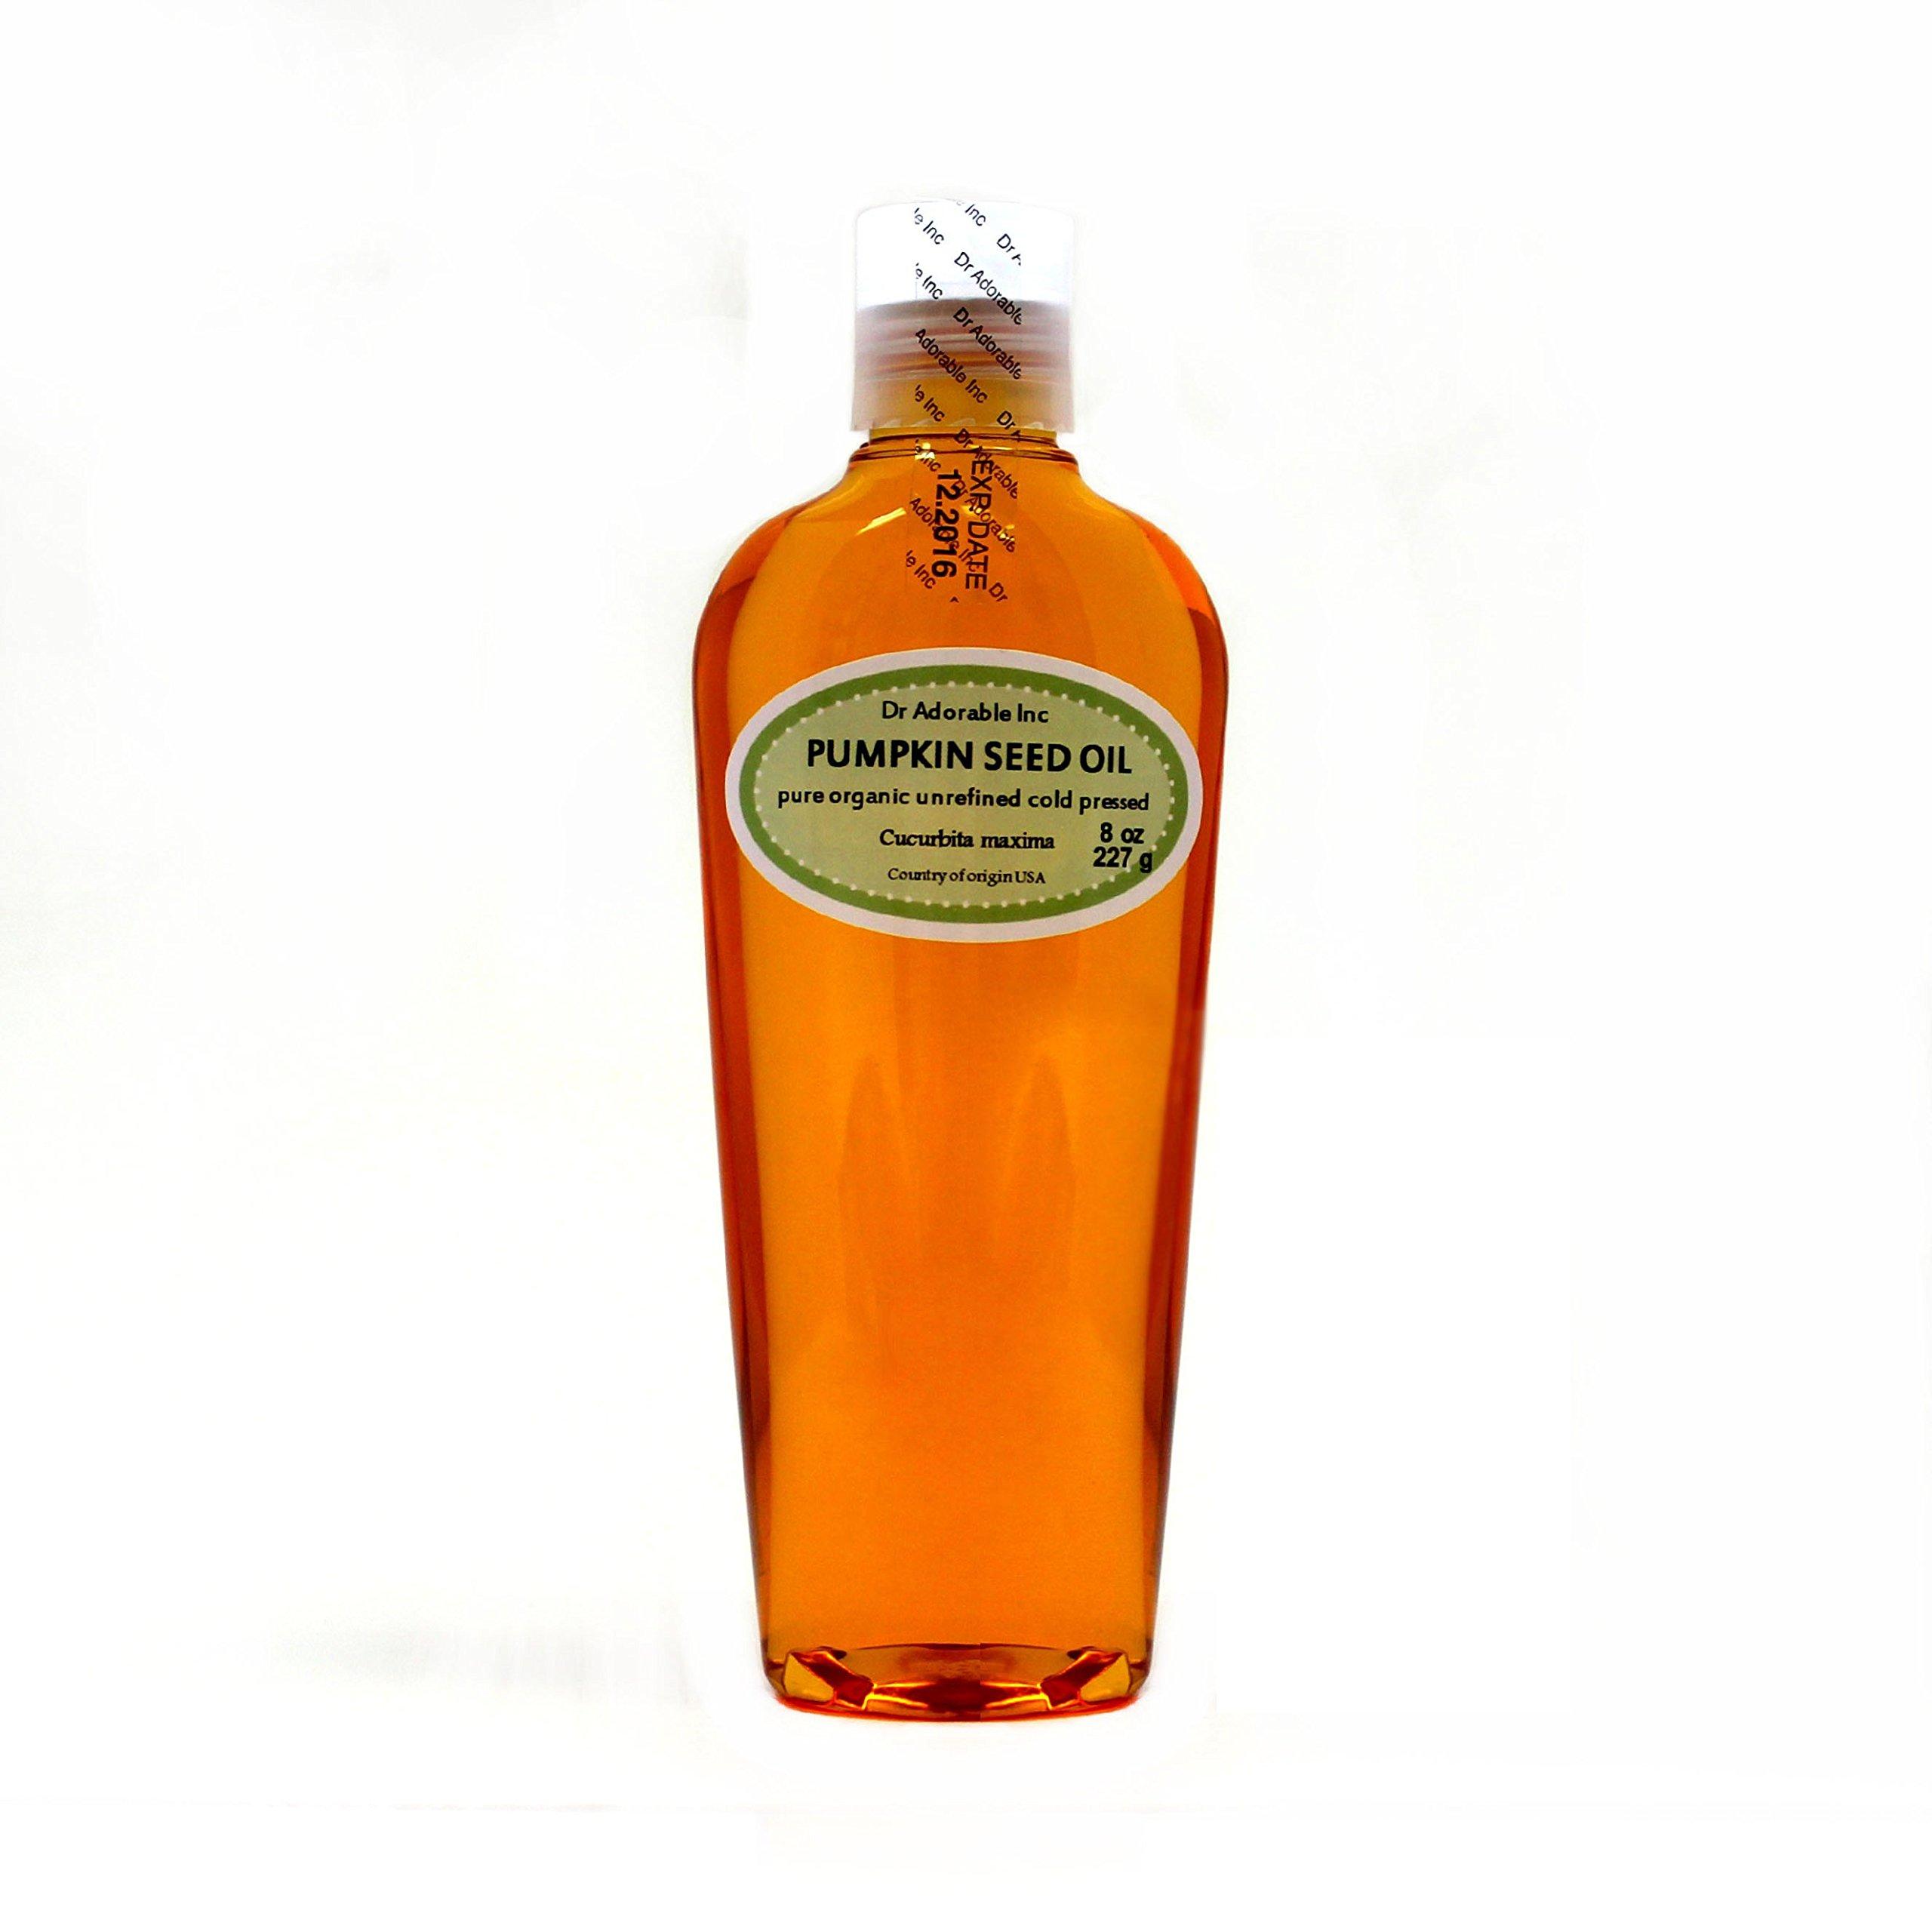 Pumpkin Seed Oil Unrefined Virgin Cold Pressed Organic 8 Oz